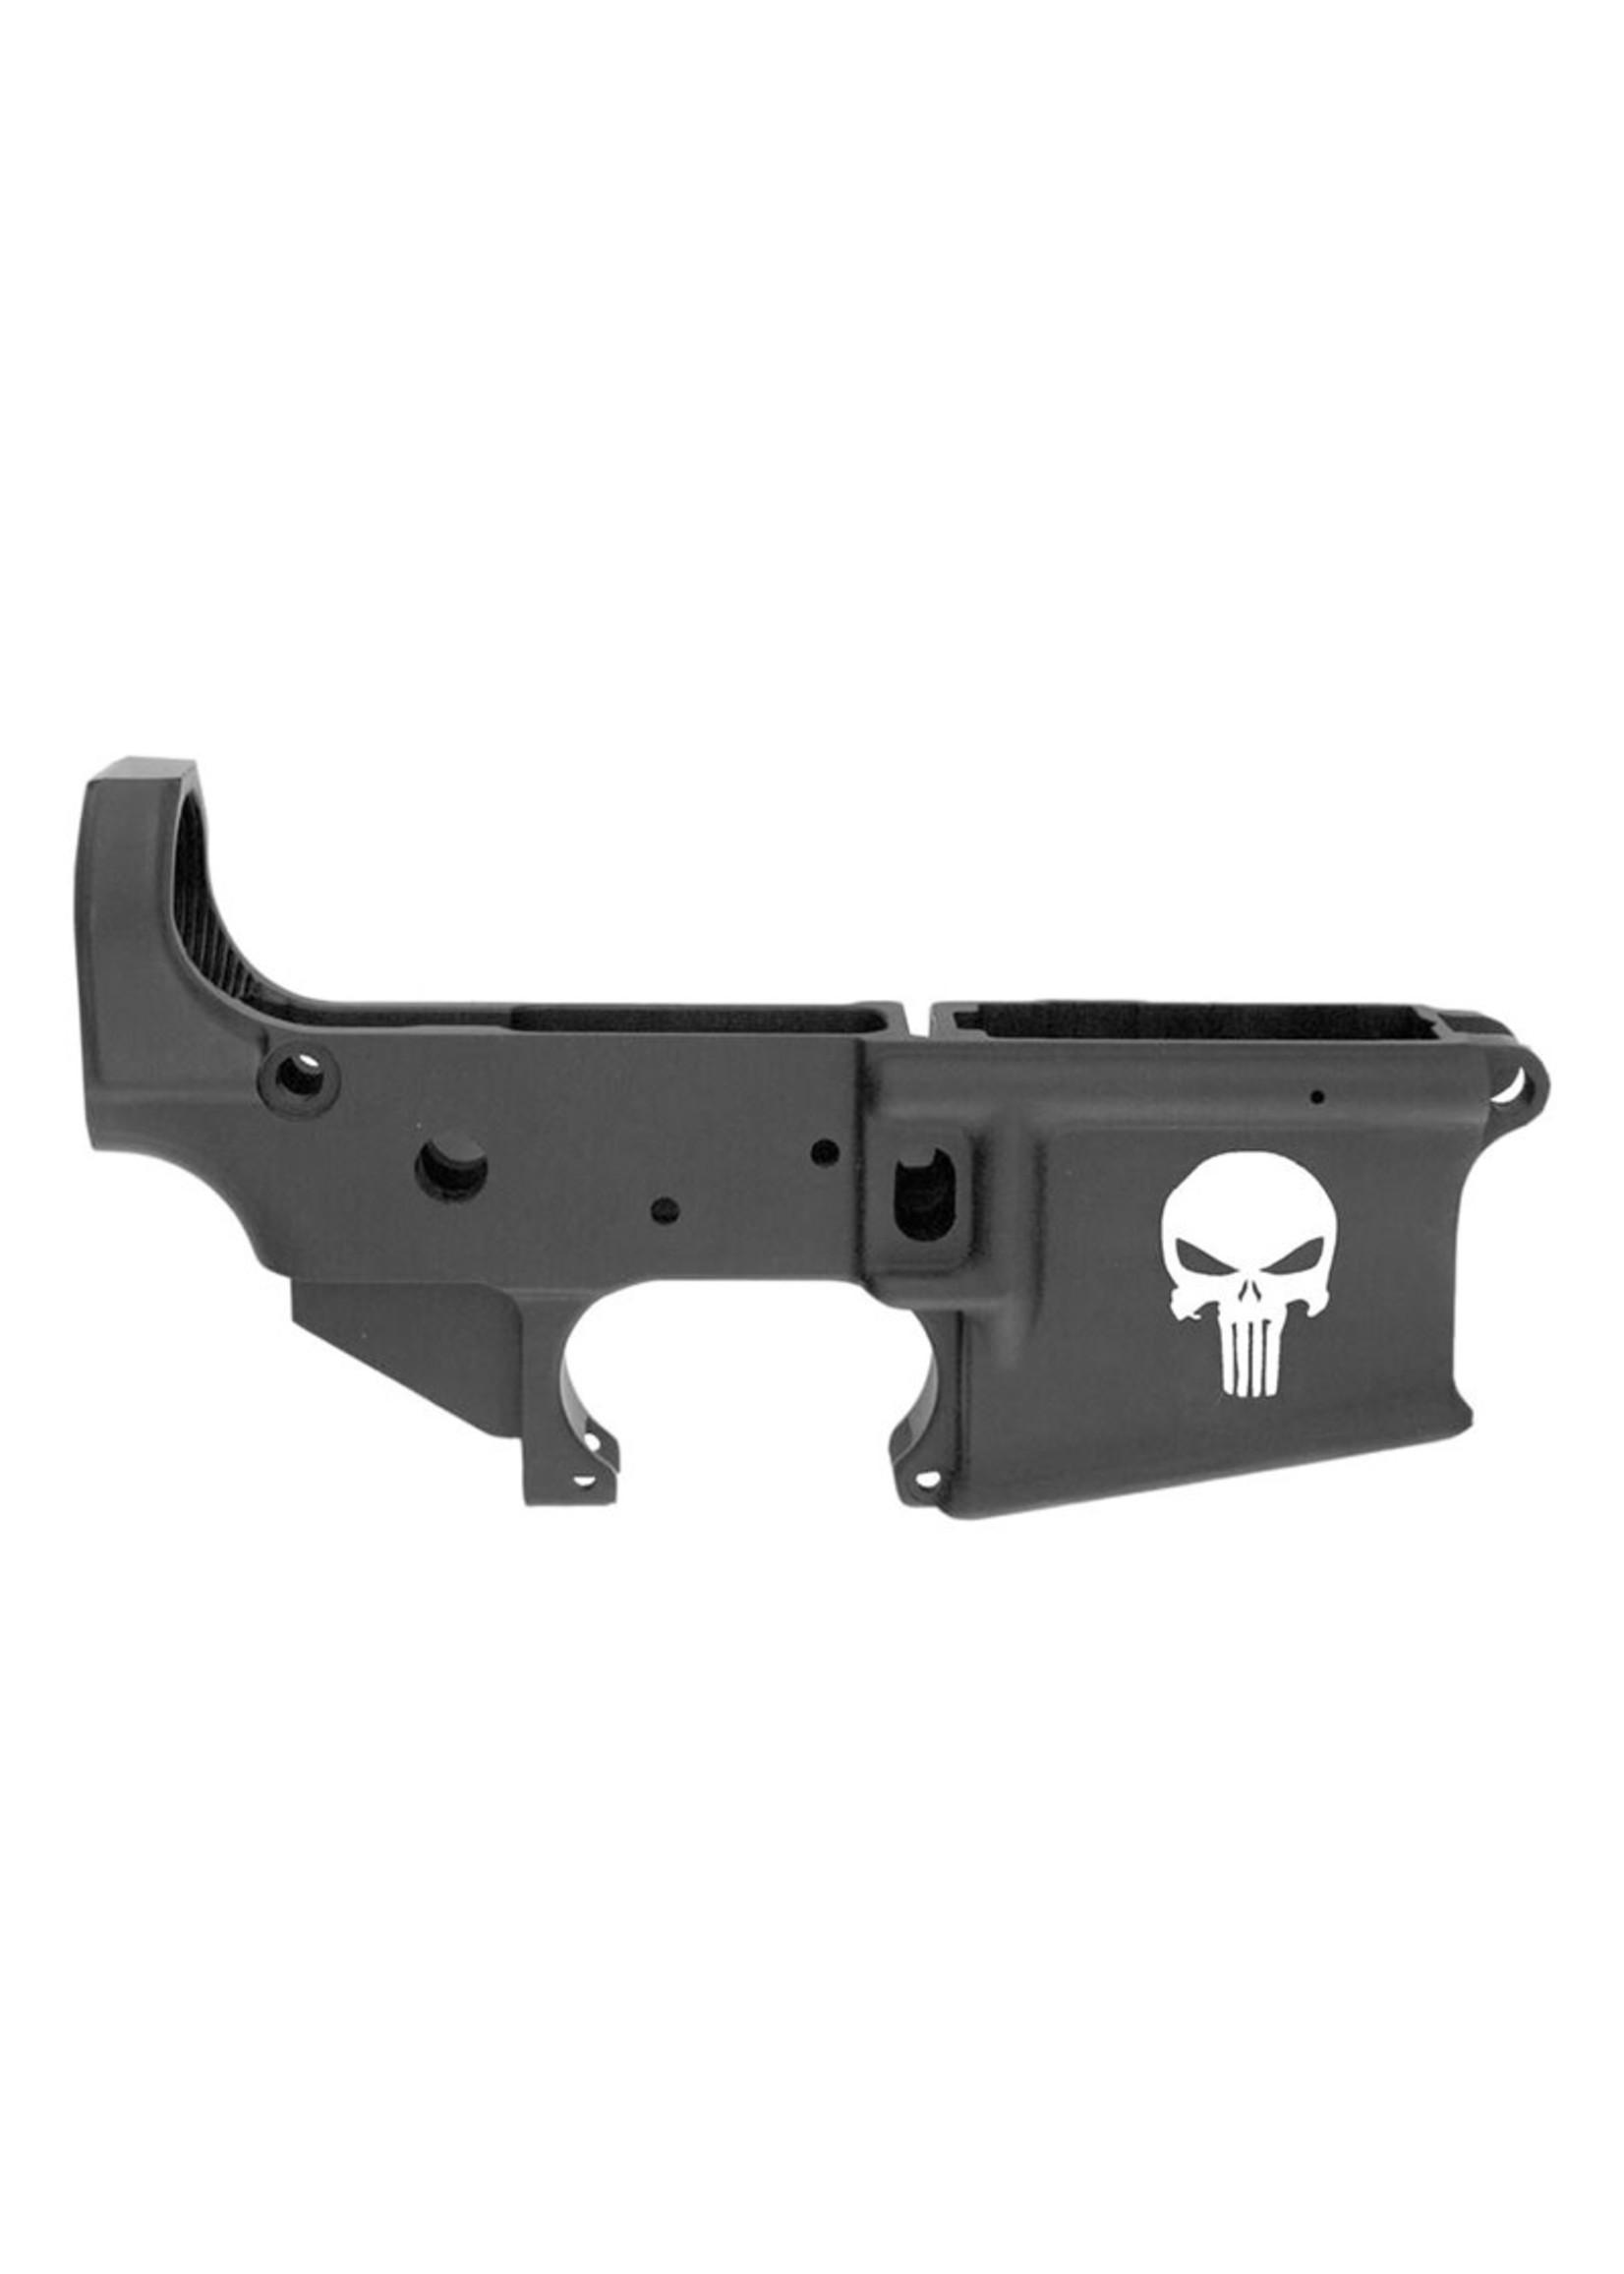 Anderson Manufacturing Anderson Mfg AR-15 Lower Receiver, open, semi-auto, multi-caliber, black, Punisher logo